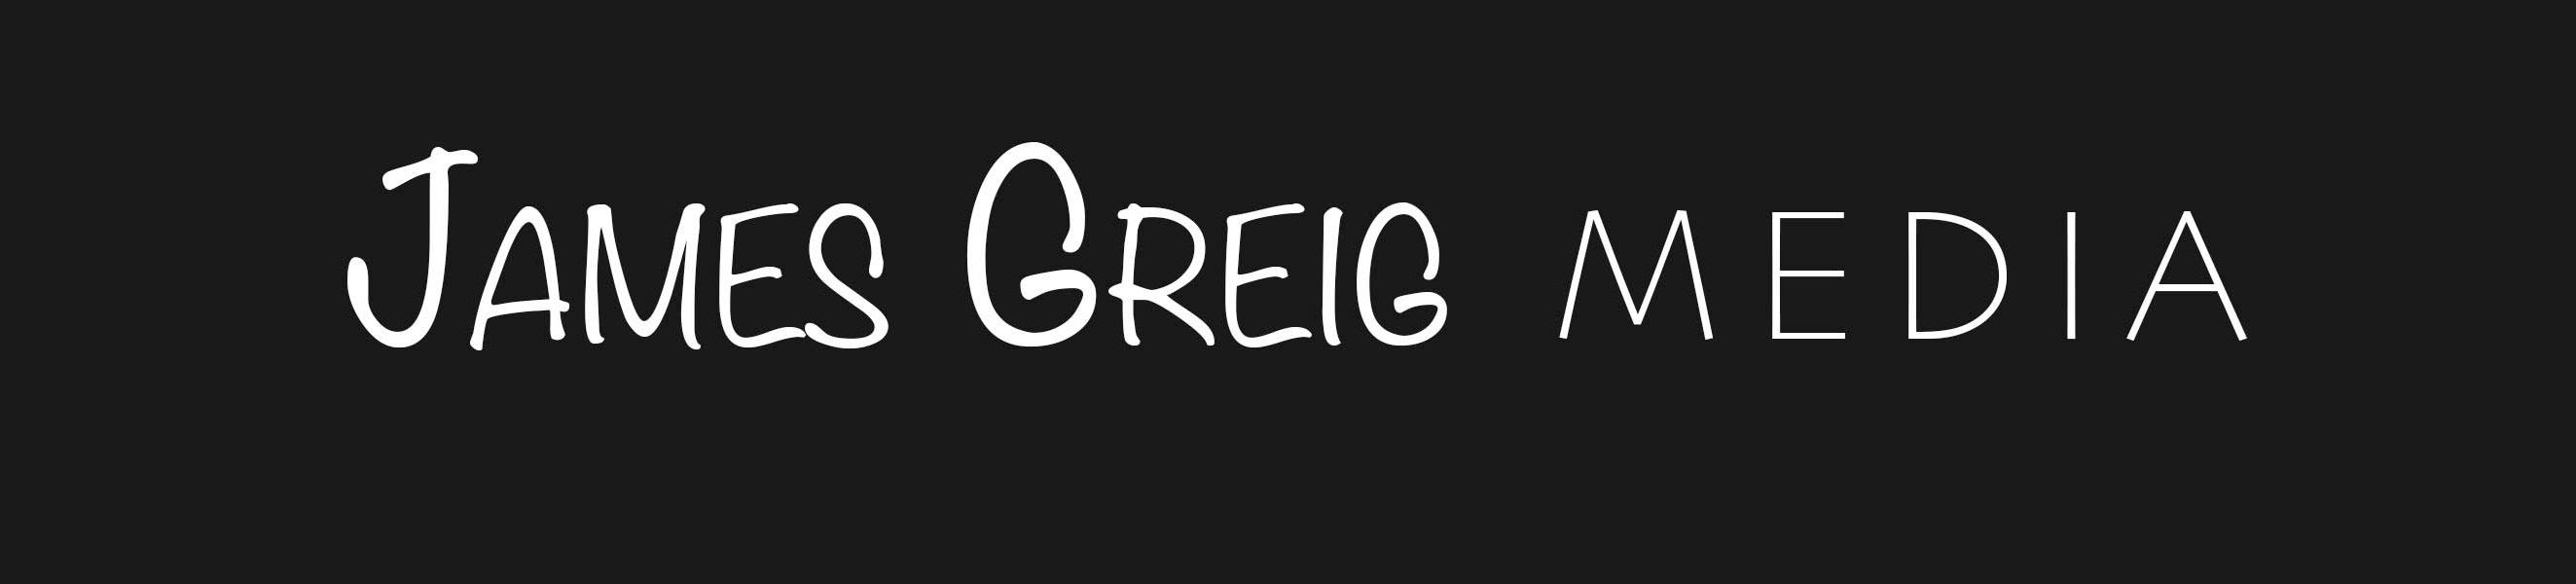 James Greig Media